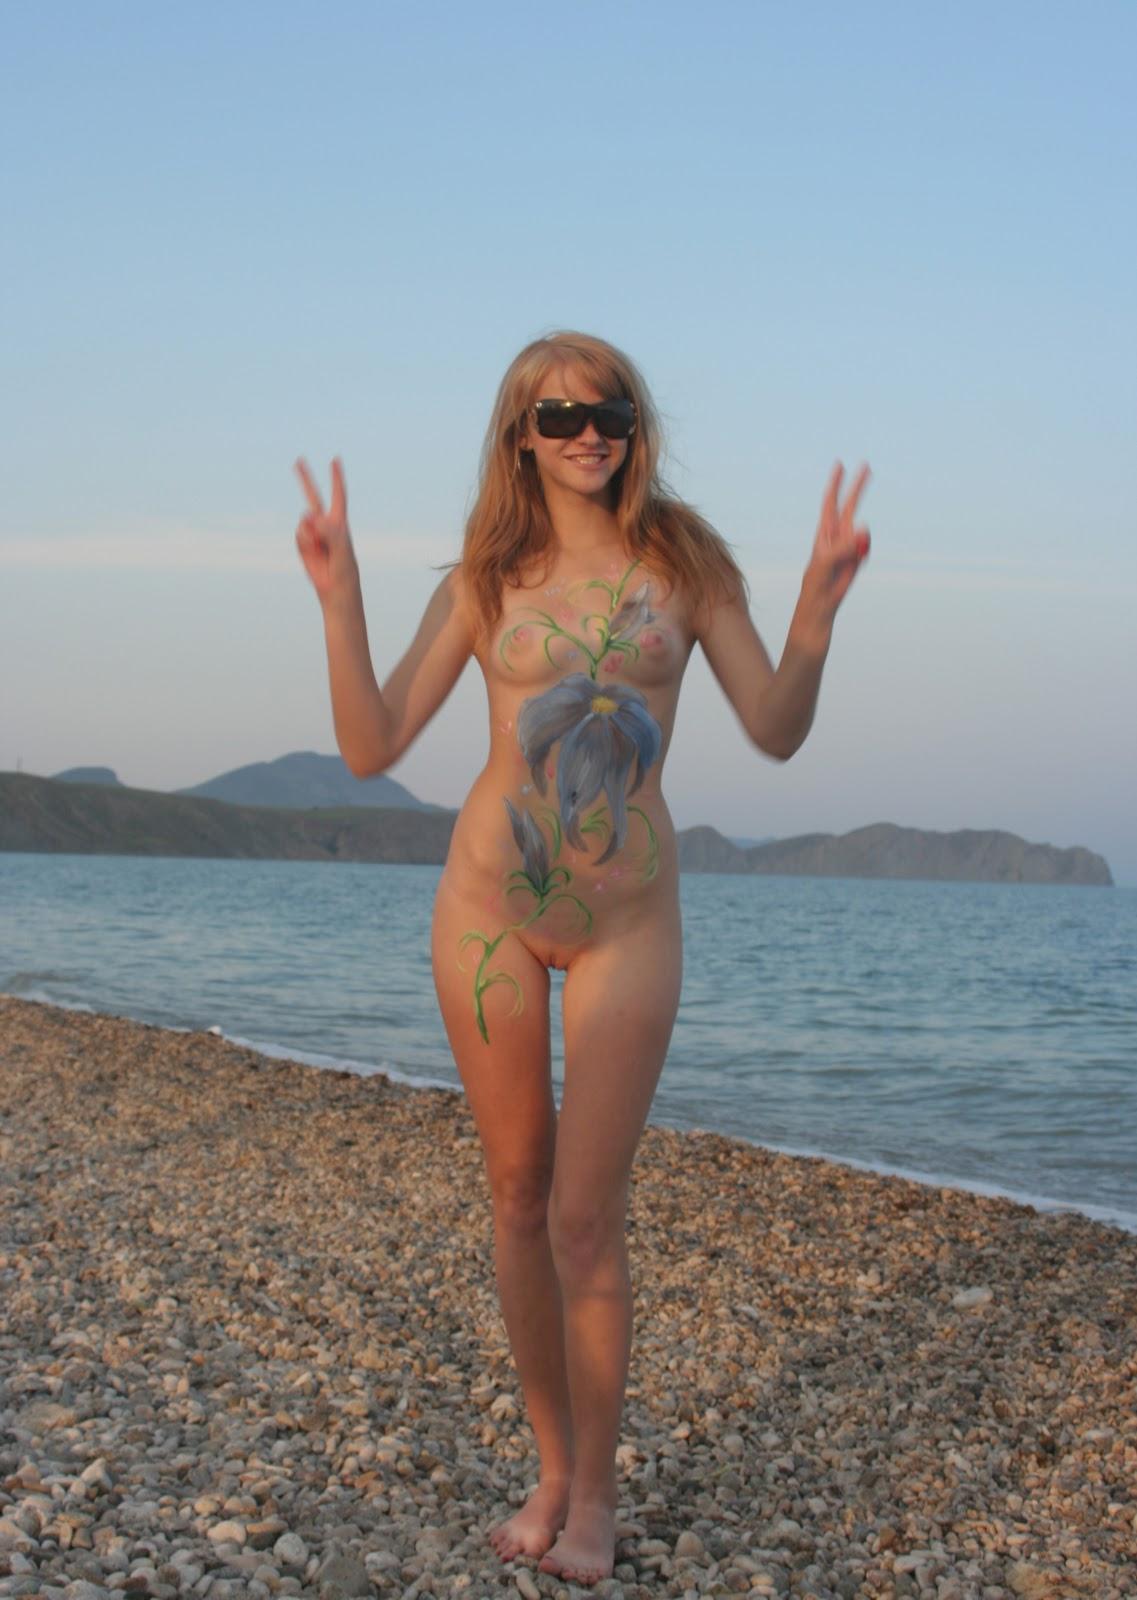 Tattooed hippie chick showing off her body art